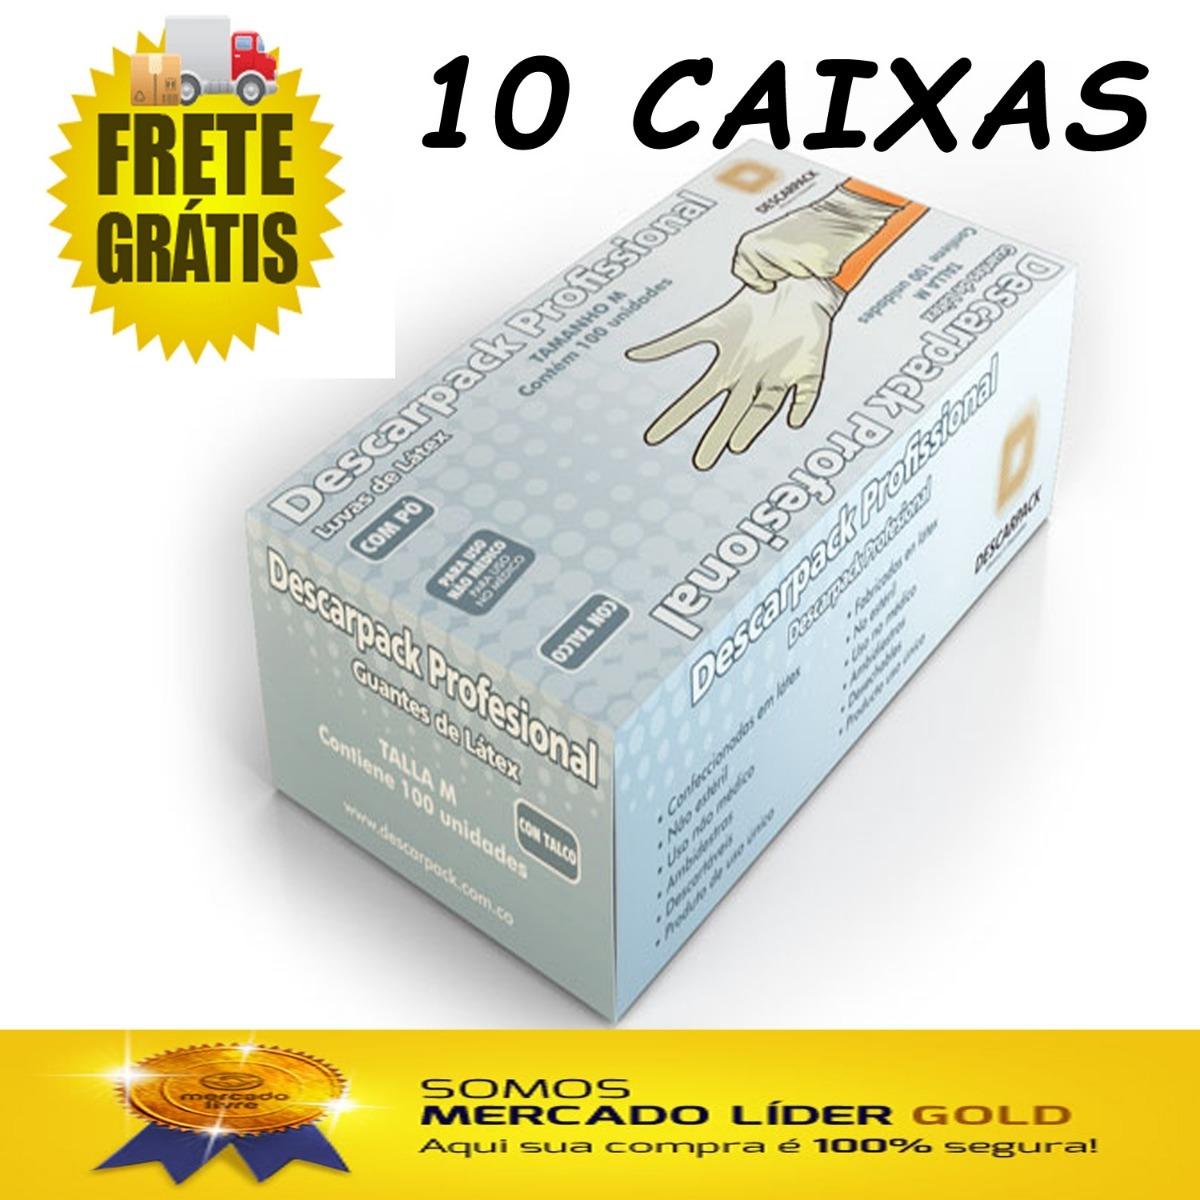 Luva De Látex Descarpack Tam M C  100 - Cx C  10 Unid - R  260,26 em  Mercado Livre 05b9659d99